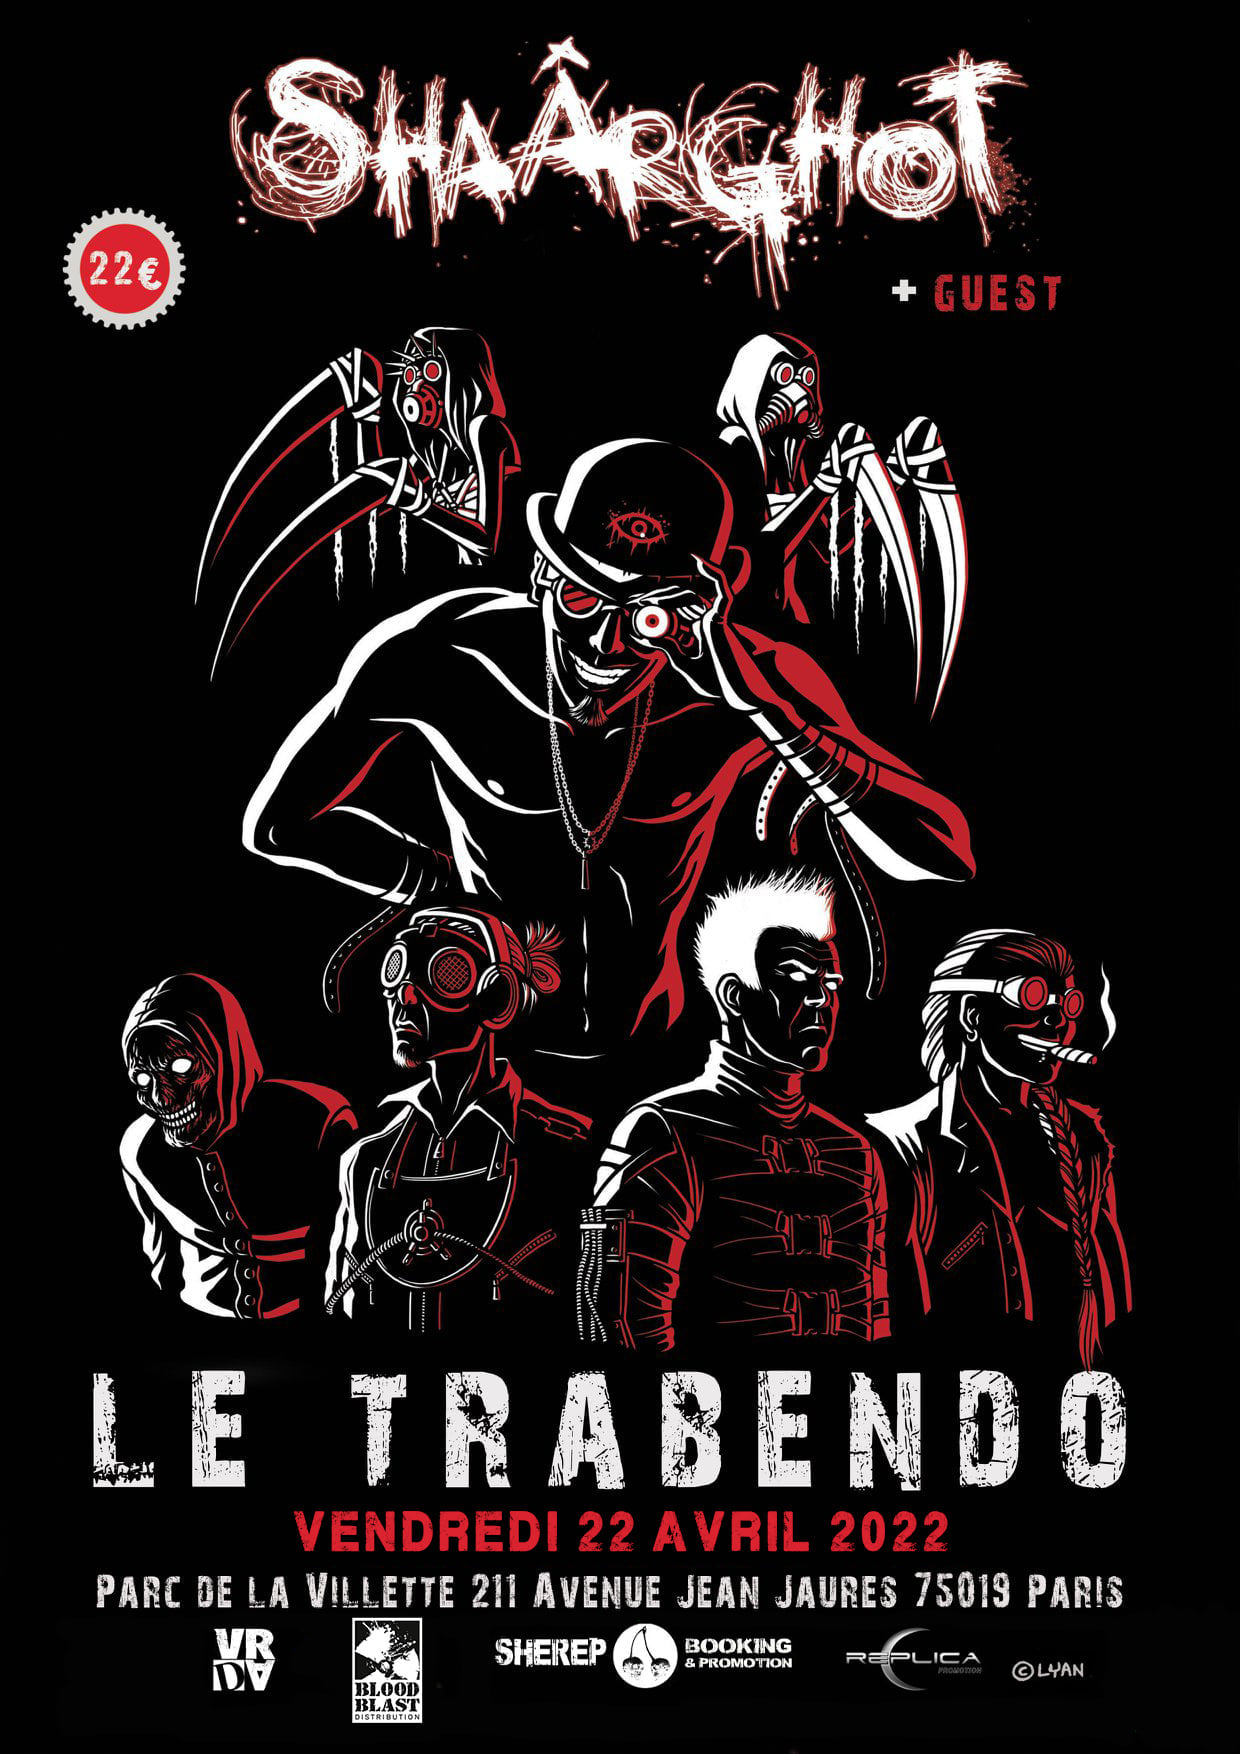 Shaârghot @ Le trabendo (Paris (75)) - 22 avril 2022